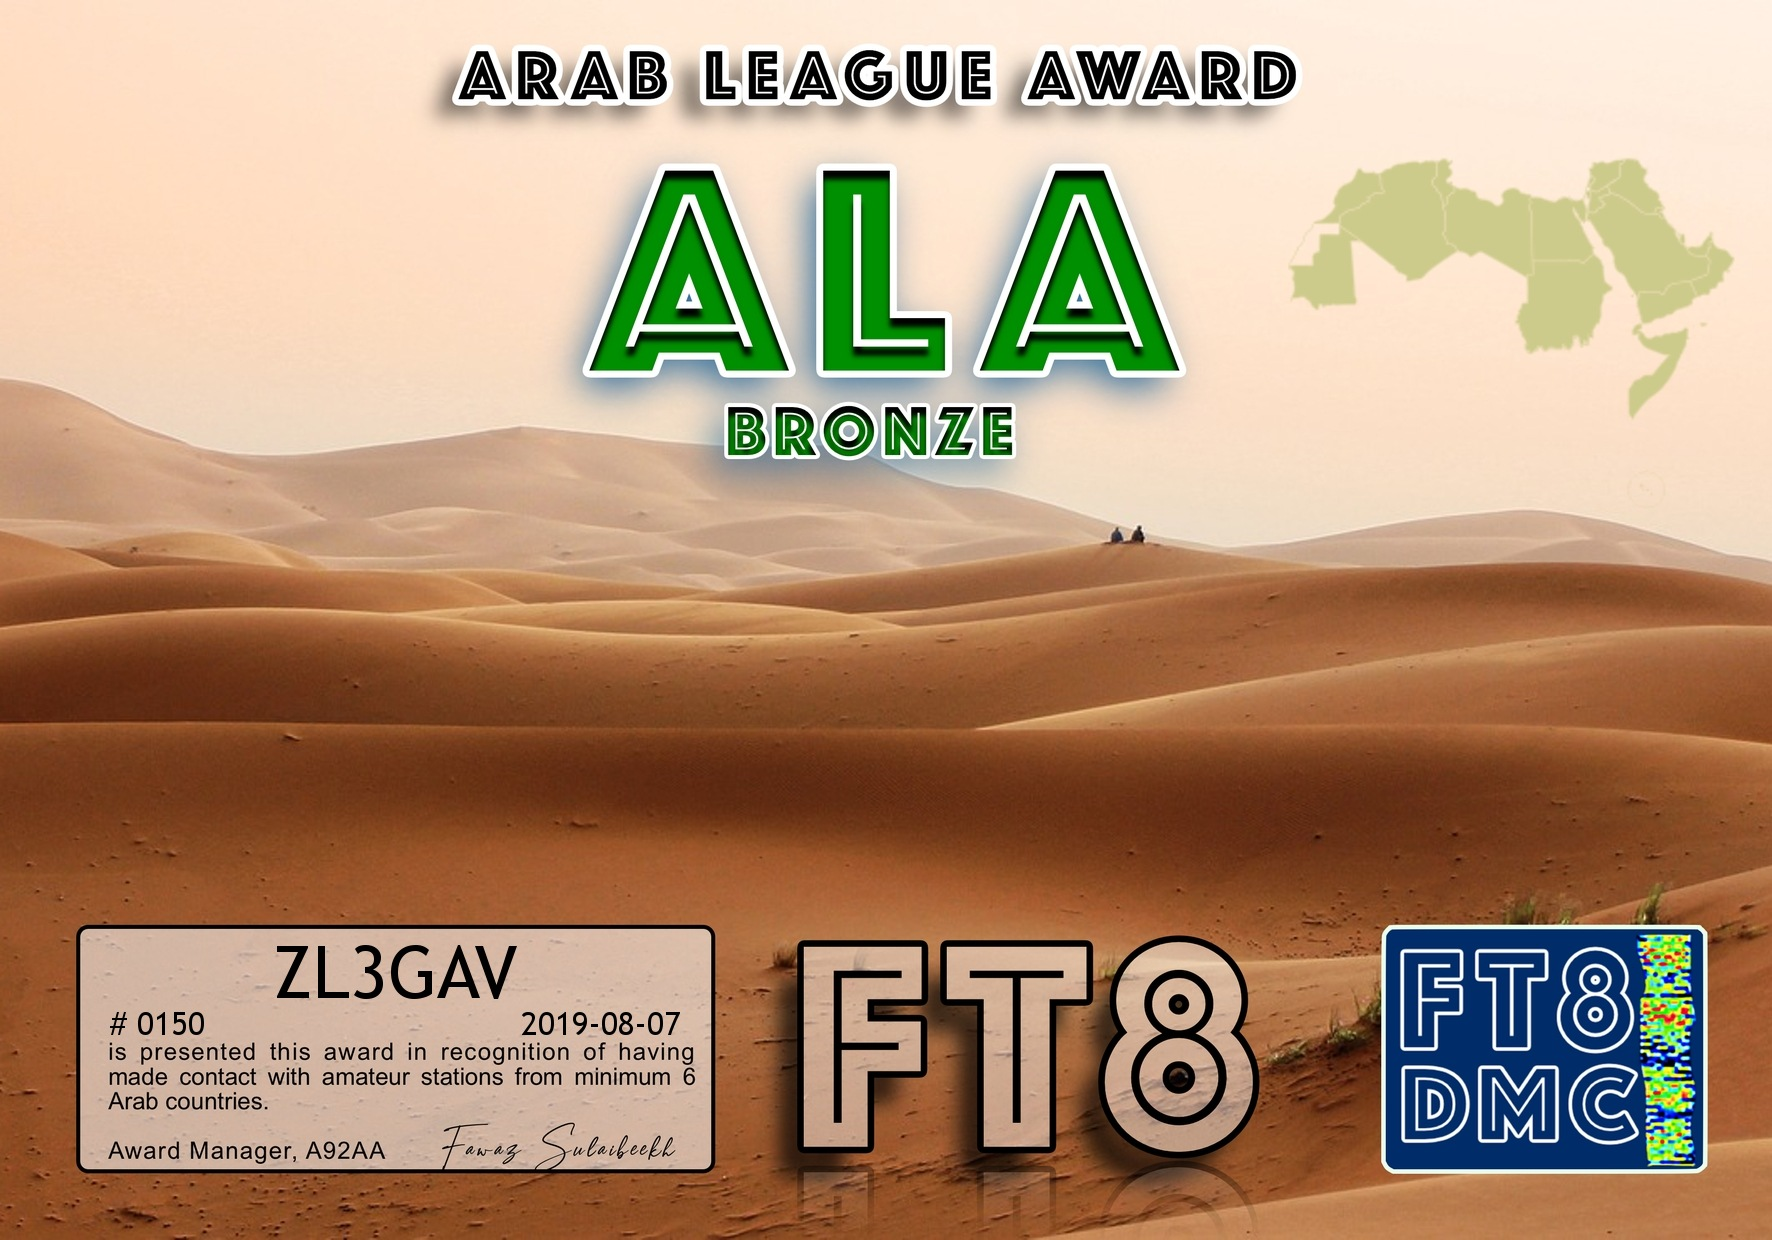 ZL3GAV-ALA-BRONZE.jpg